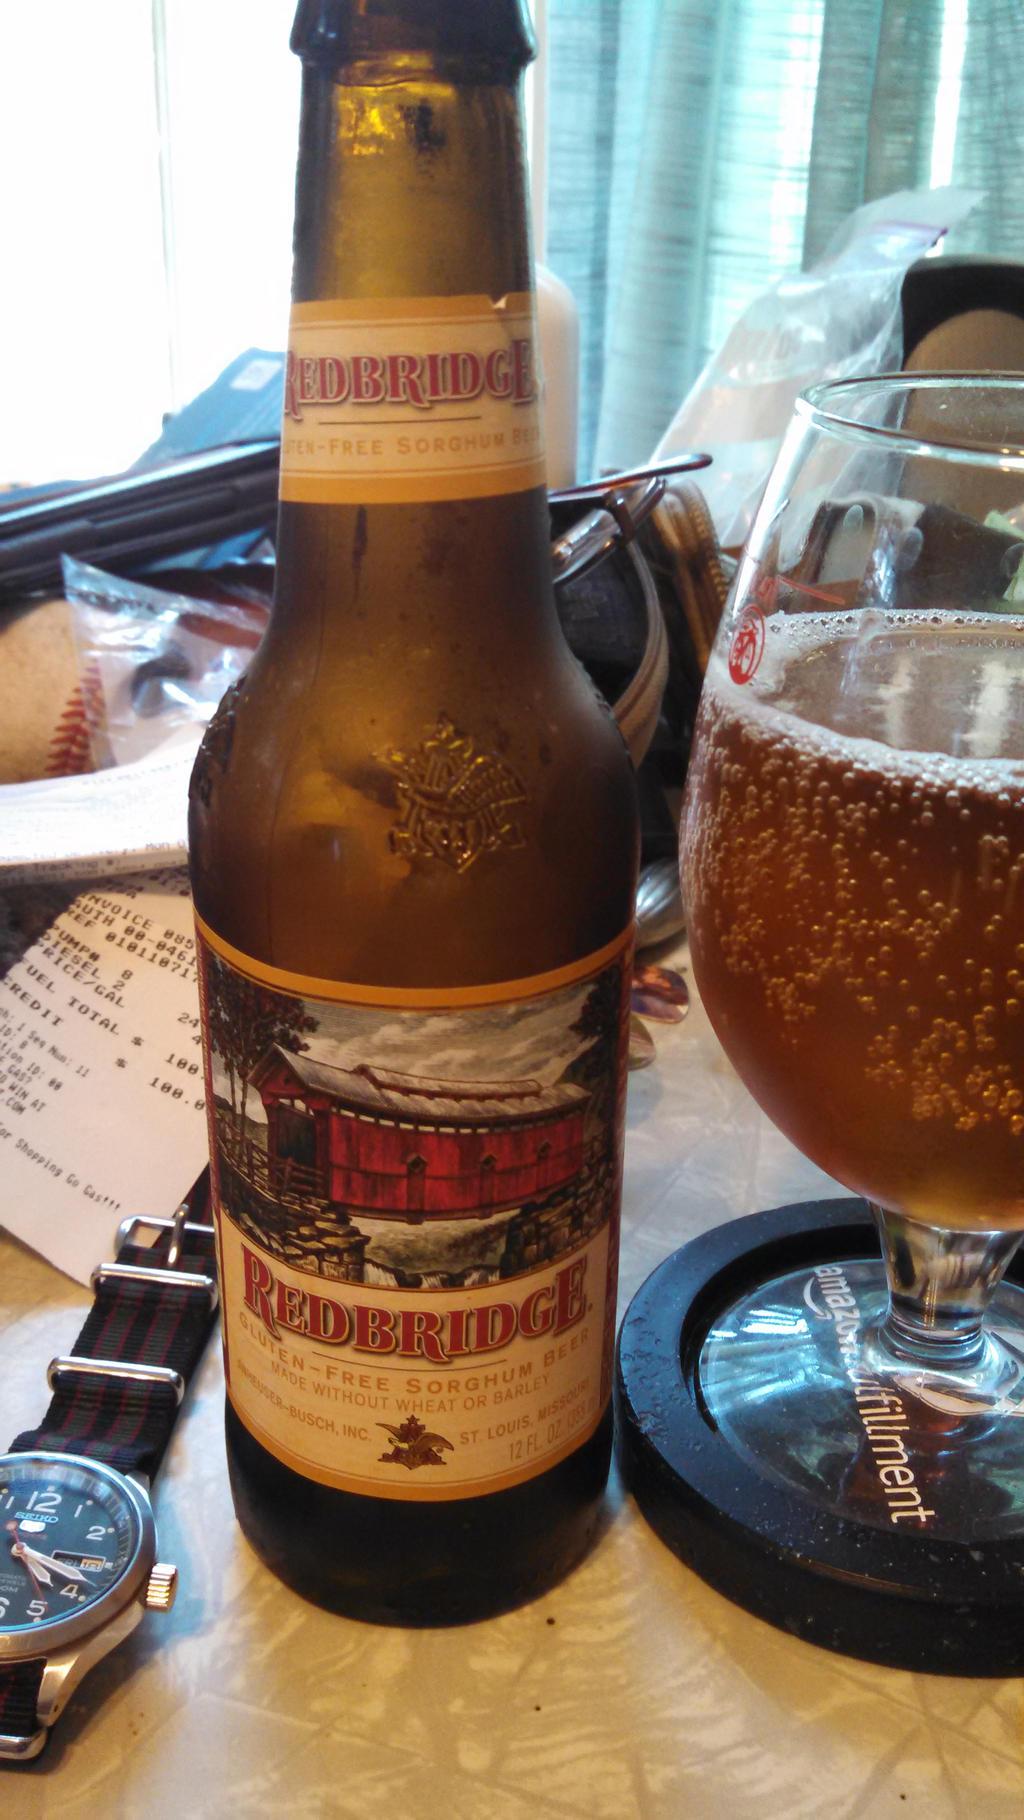 Redbridge Gluten Free Sorghum Beer Redbridge Gluten Free Sorghum Beerby Swen Swenson